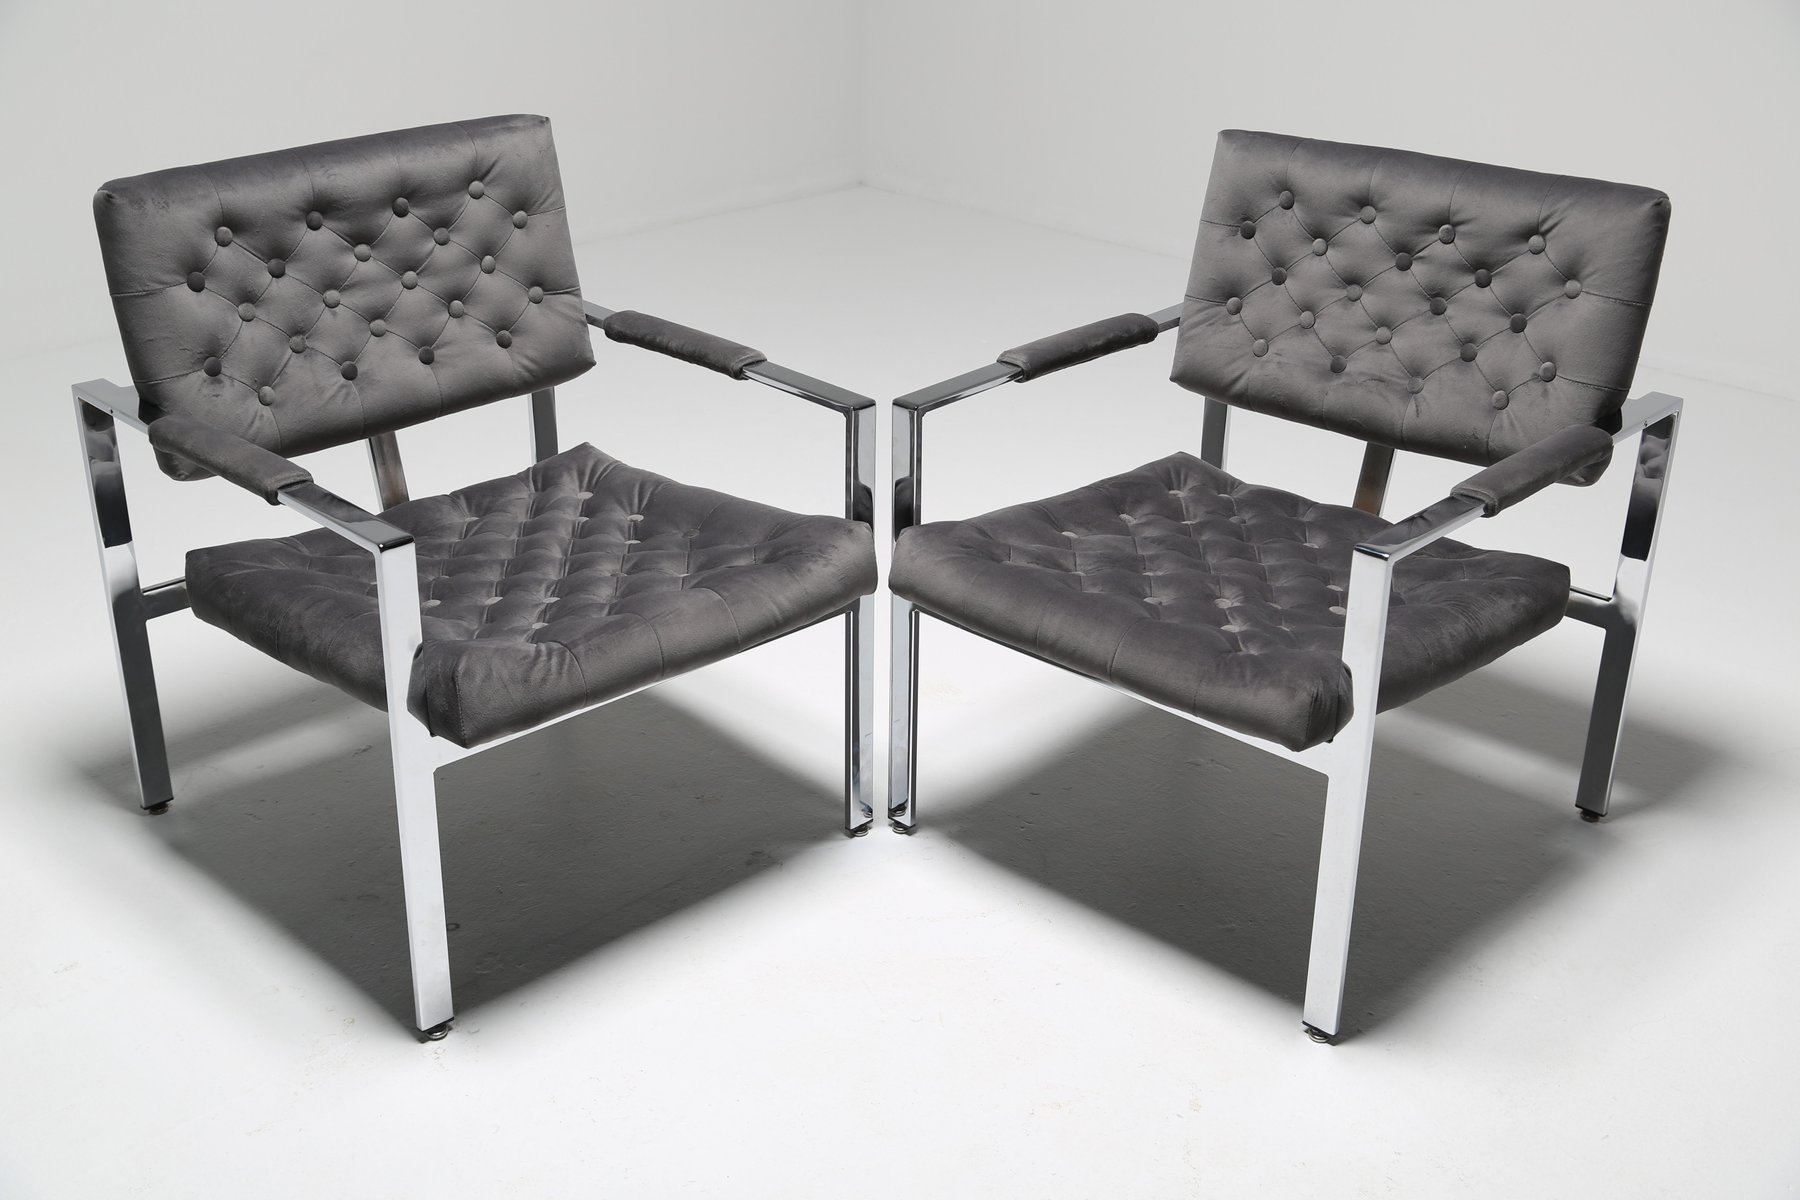 milo baughman furniture. Vintage Lounge Chairs By Milo Baughman, Set Of 2 Baughman Furniture